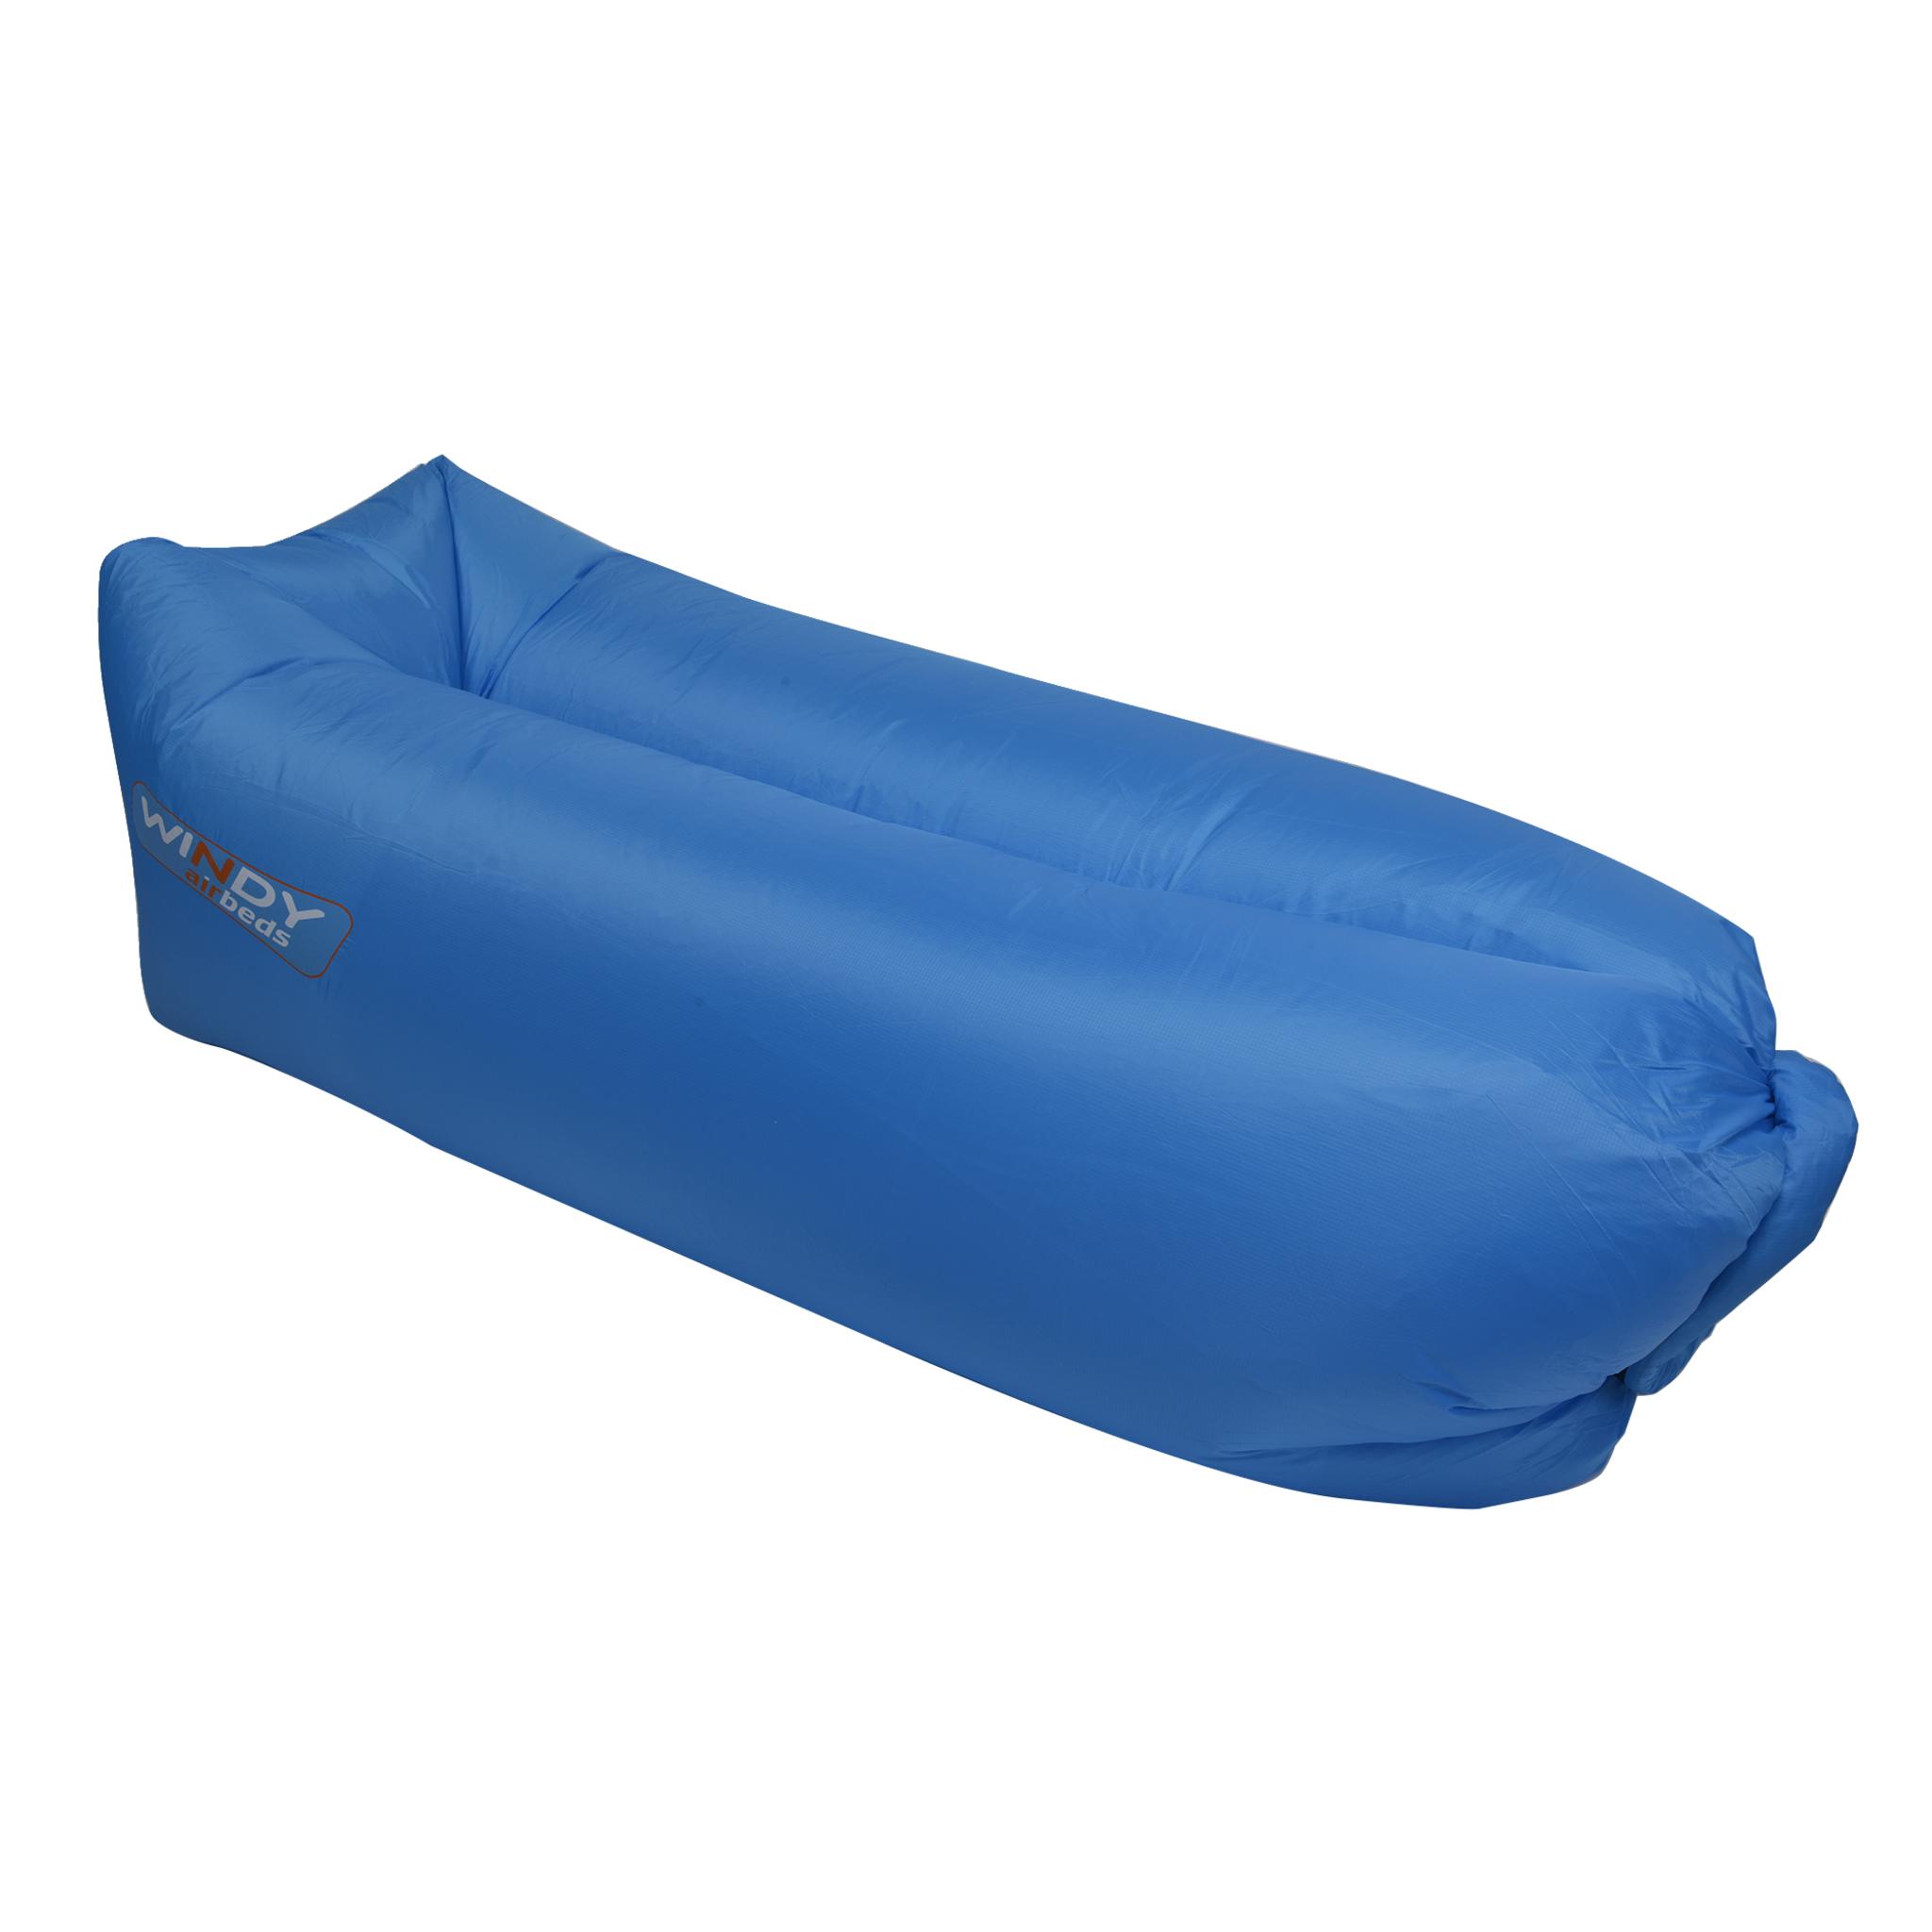 Airbed Polyester, oppblåsbar sofa 240x70 cm